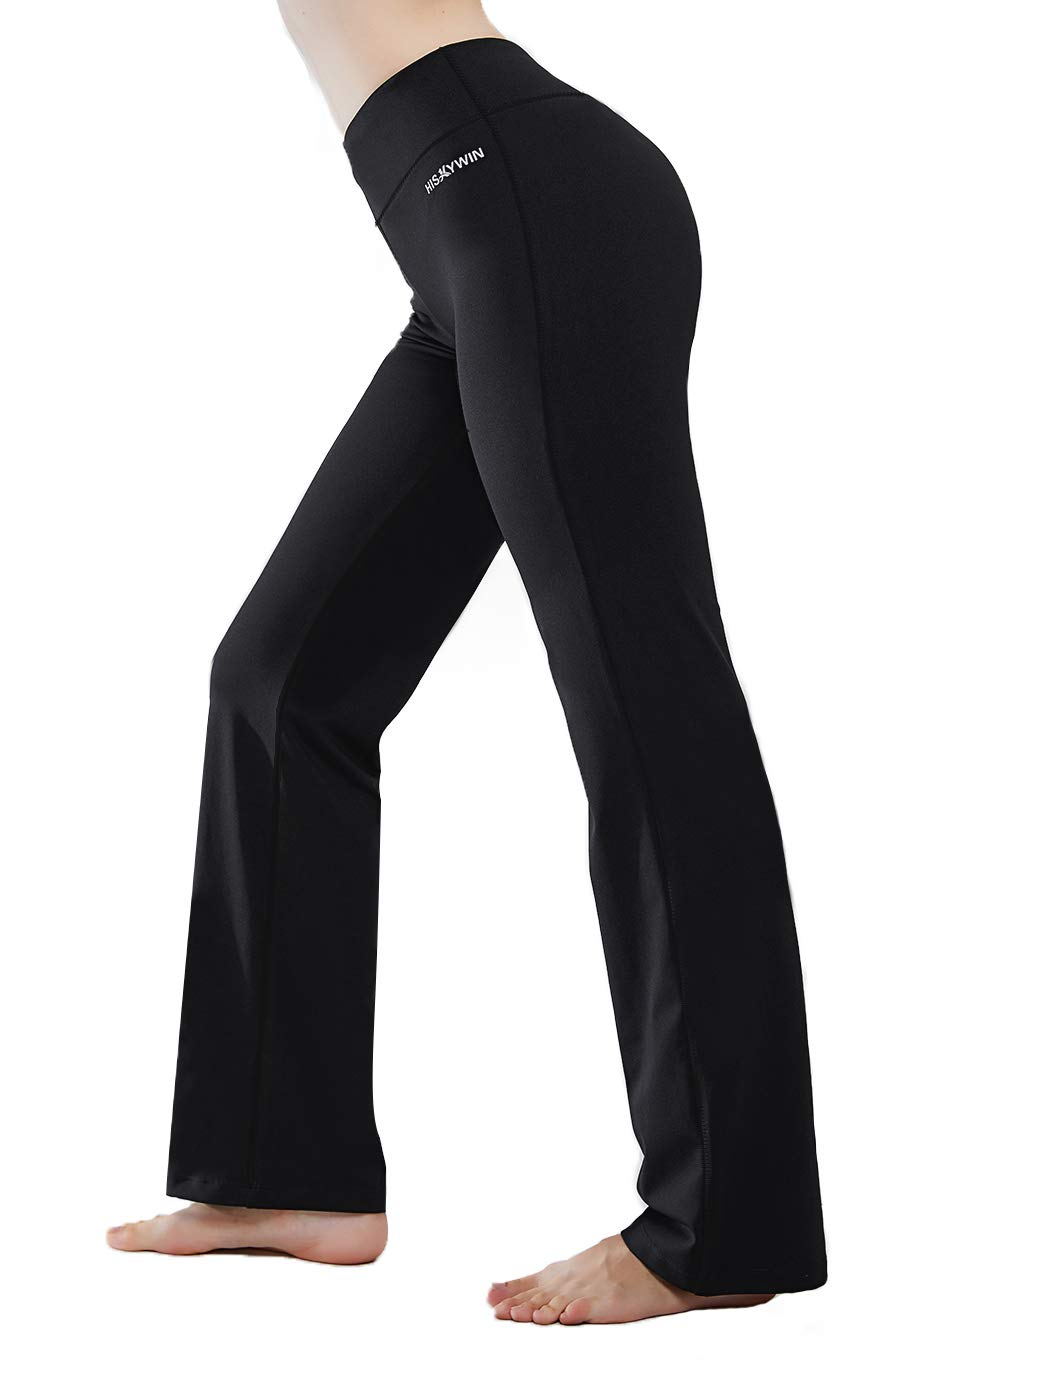 31849de3a4 HISKYWIN Inner Pocket Yoga Pants 4 Way Stretch Tummy Control Workout  Running Pants, Long Bootleg